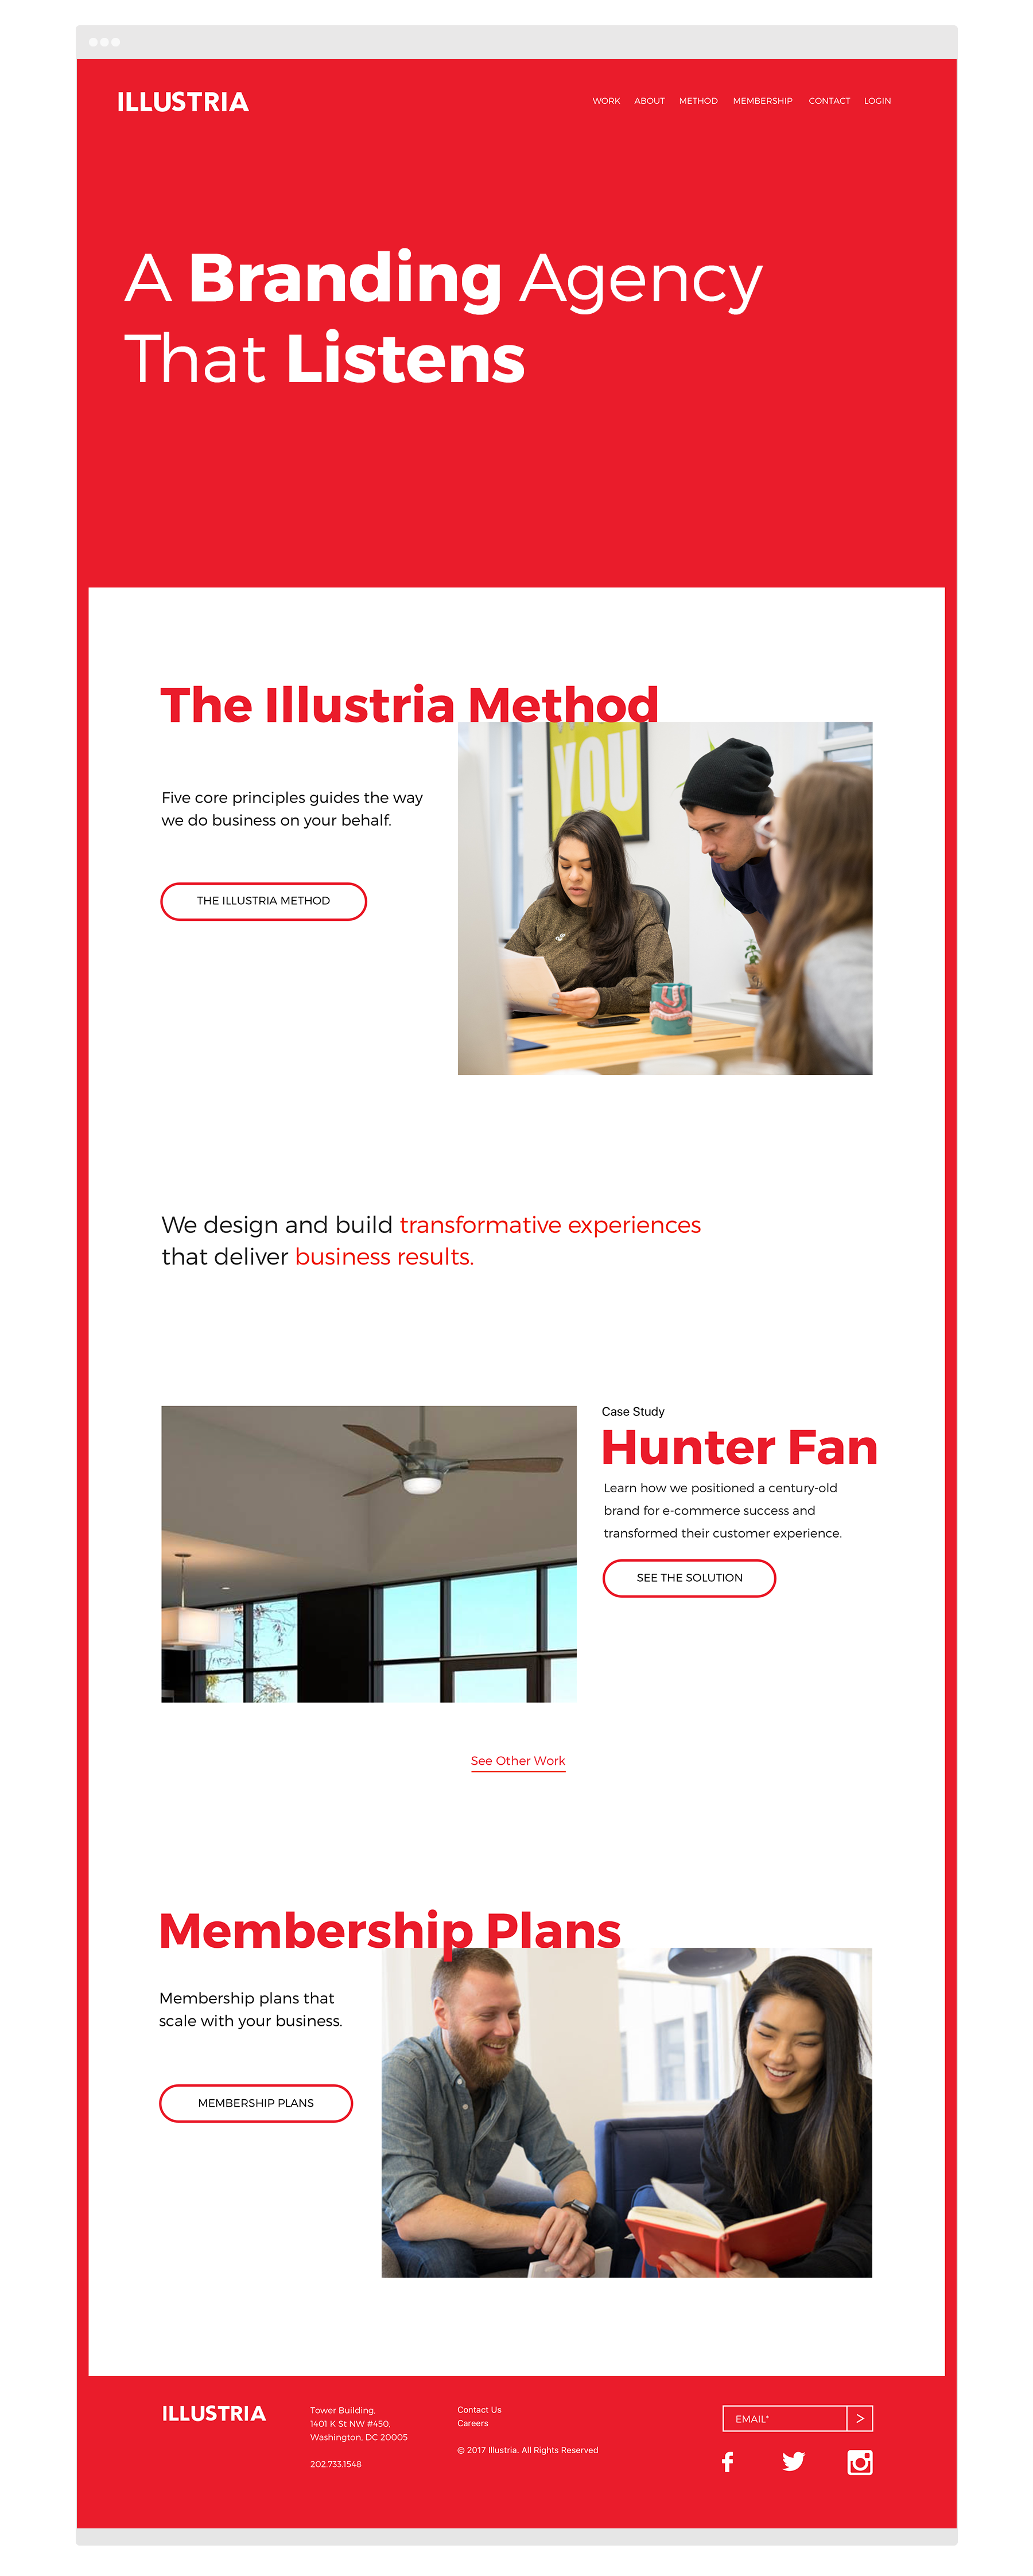 illustria-design-desktop-1-long.png